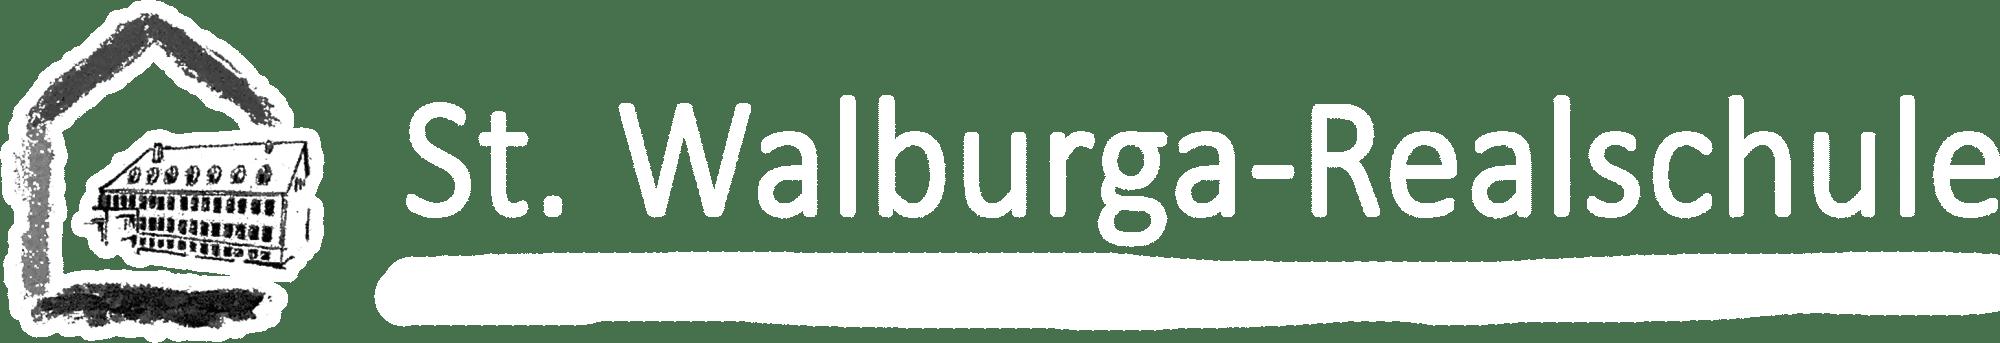 St. Walburga-Realschule Meschede